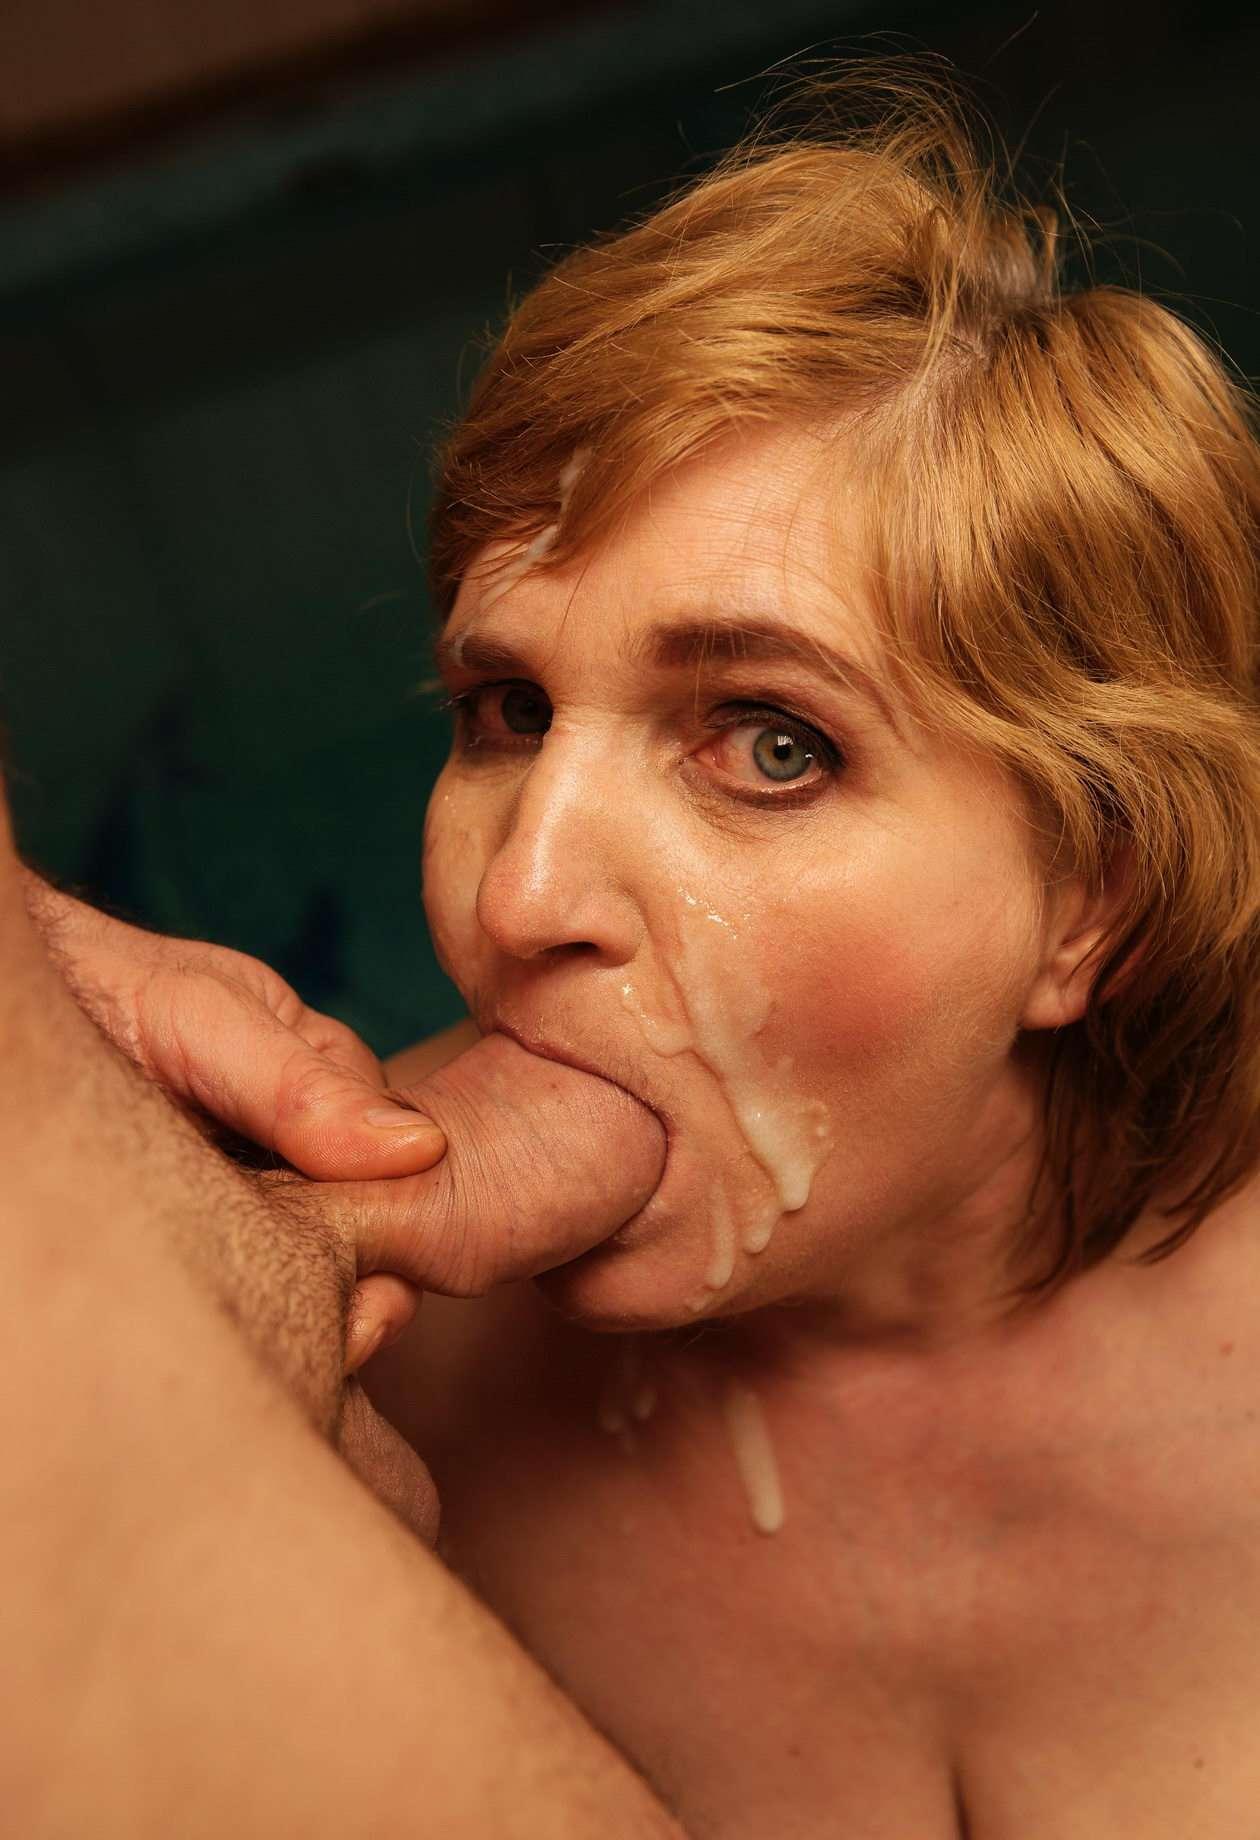 senior swingers escort porn site homoseksuell